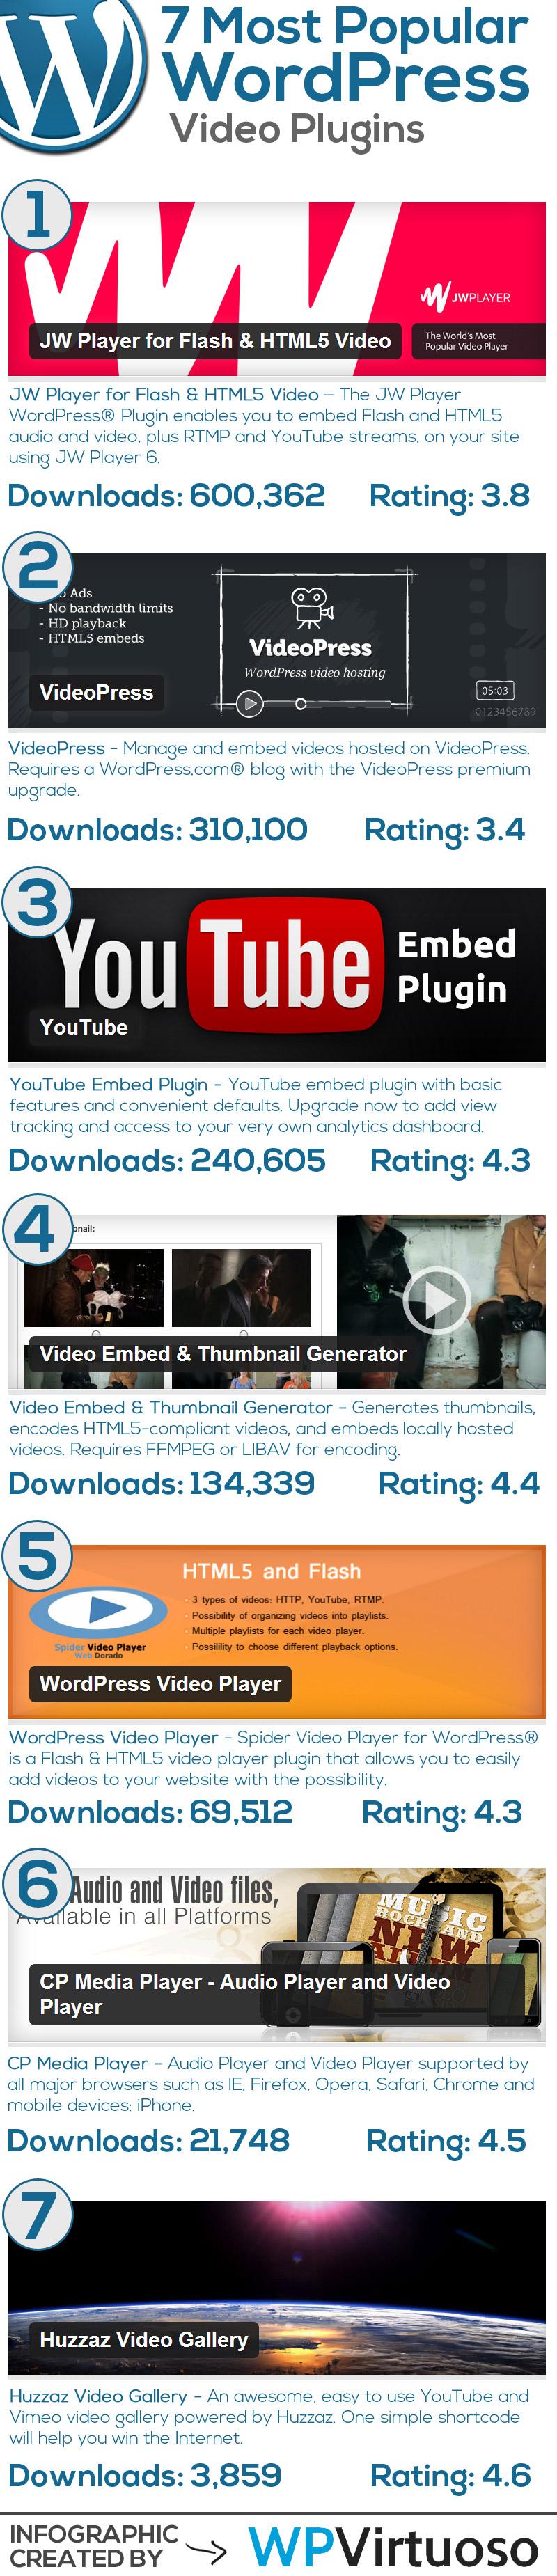 Best-Wordpress-Video-Plugins-Infographic